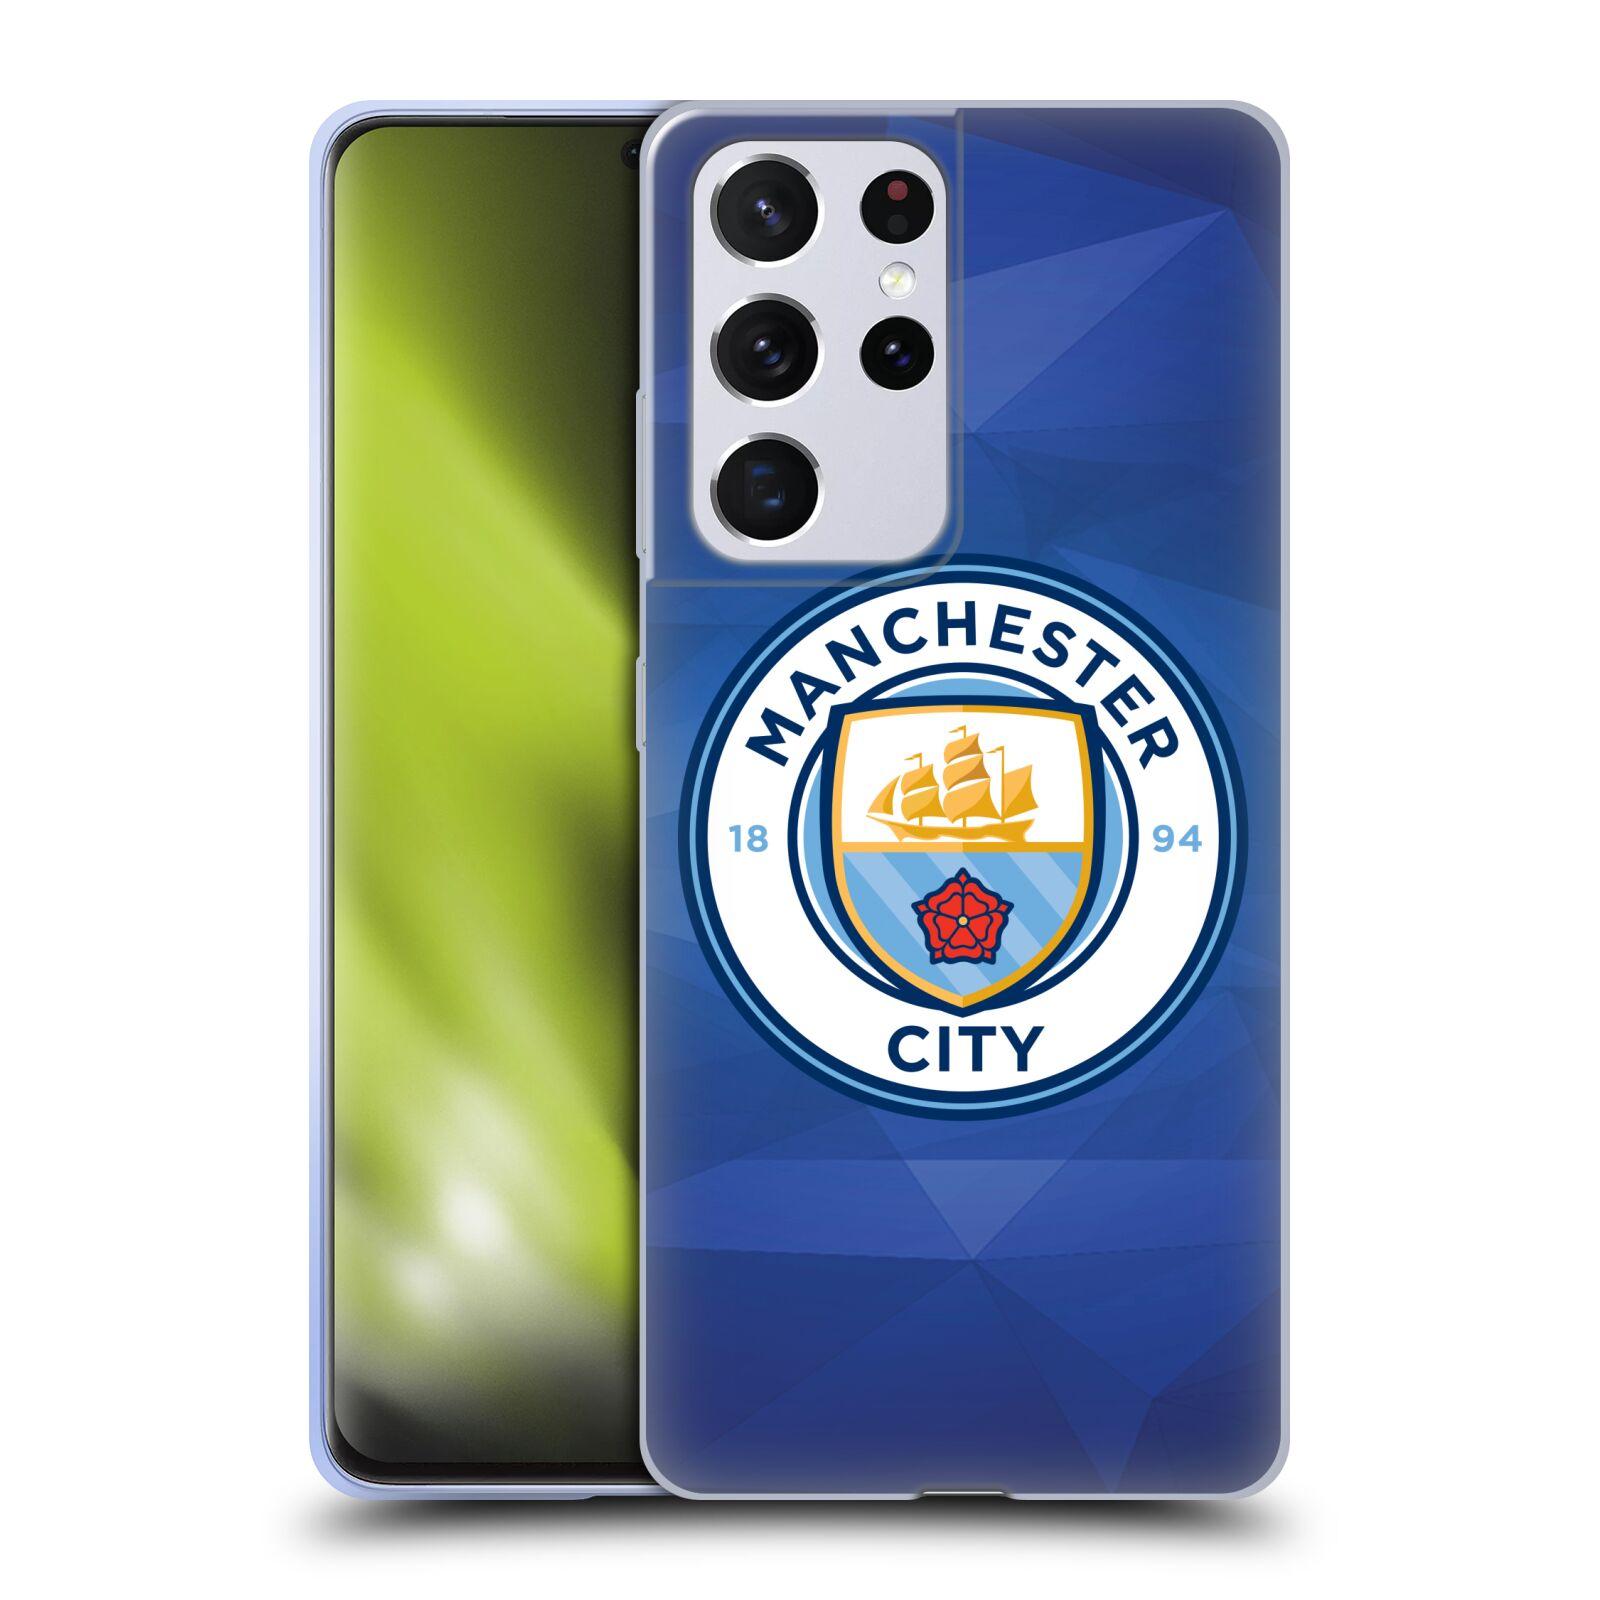 Silikonové pouzdro na mobil Samsung Galaxy S21 Ultra 5G - Head Case - Manchester City FC - Modré nové logo